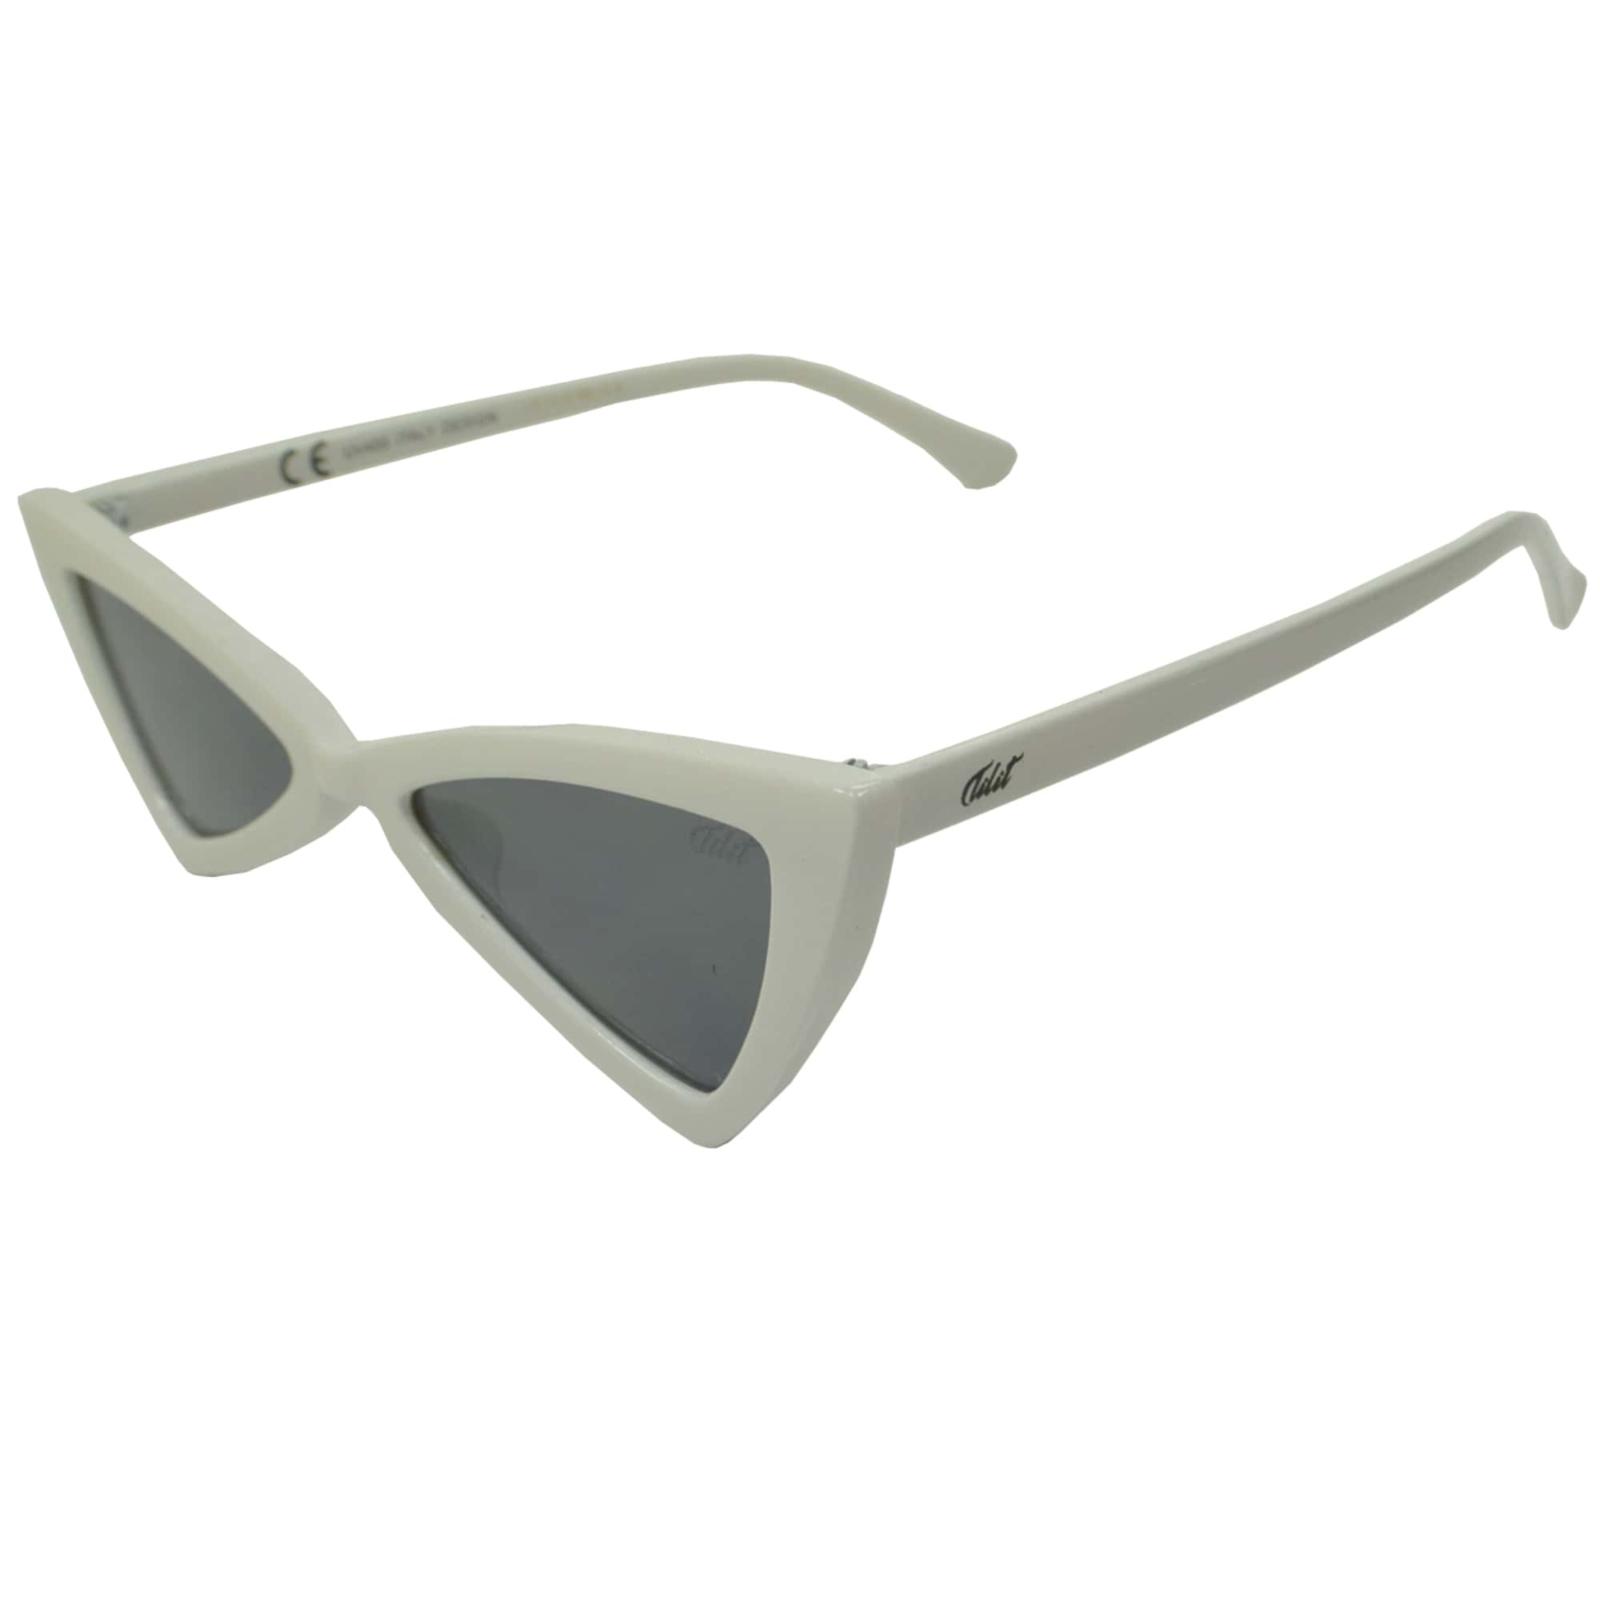 Óculos De Sol Tilit Feminino Acetato Butterfly - Branco